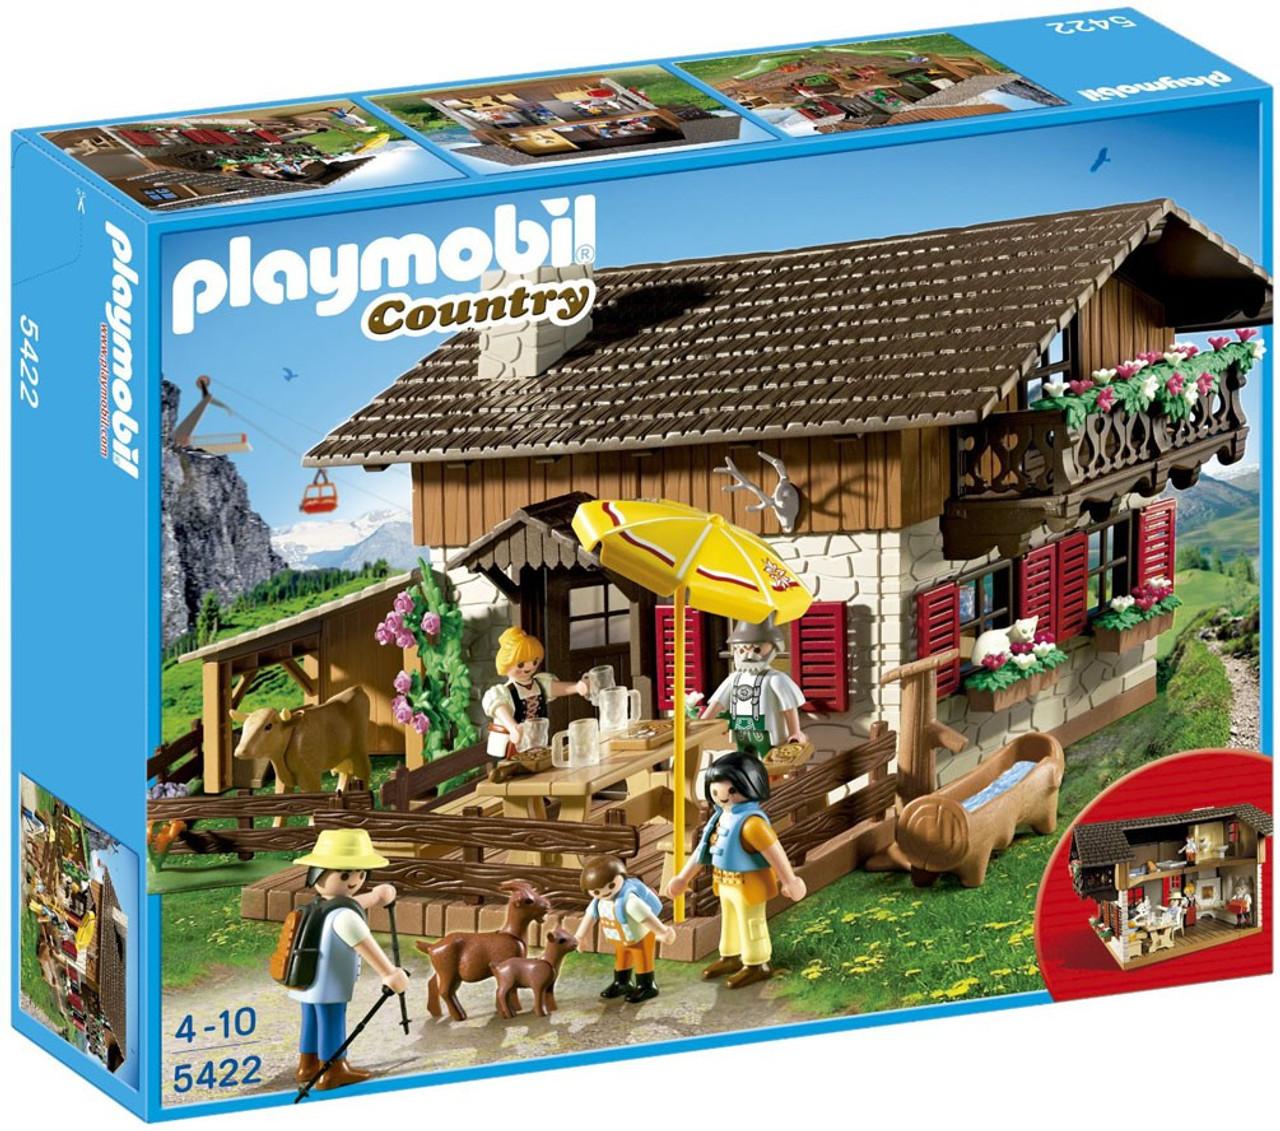 playmobil country alpine lodge set 5422 toywiz. Black Bedroom Furniture Sets. Home Design Ideas